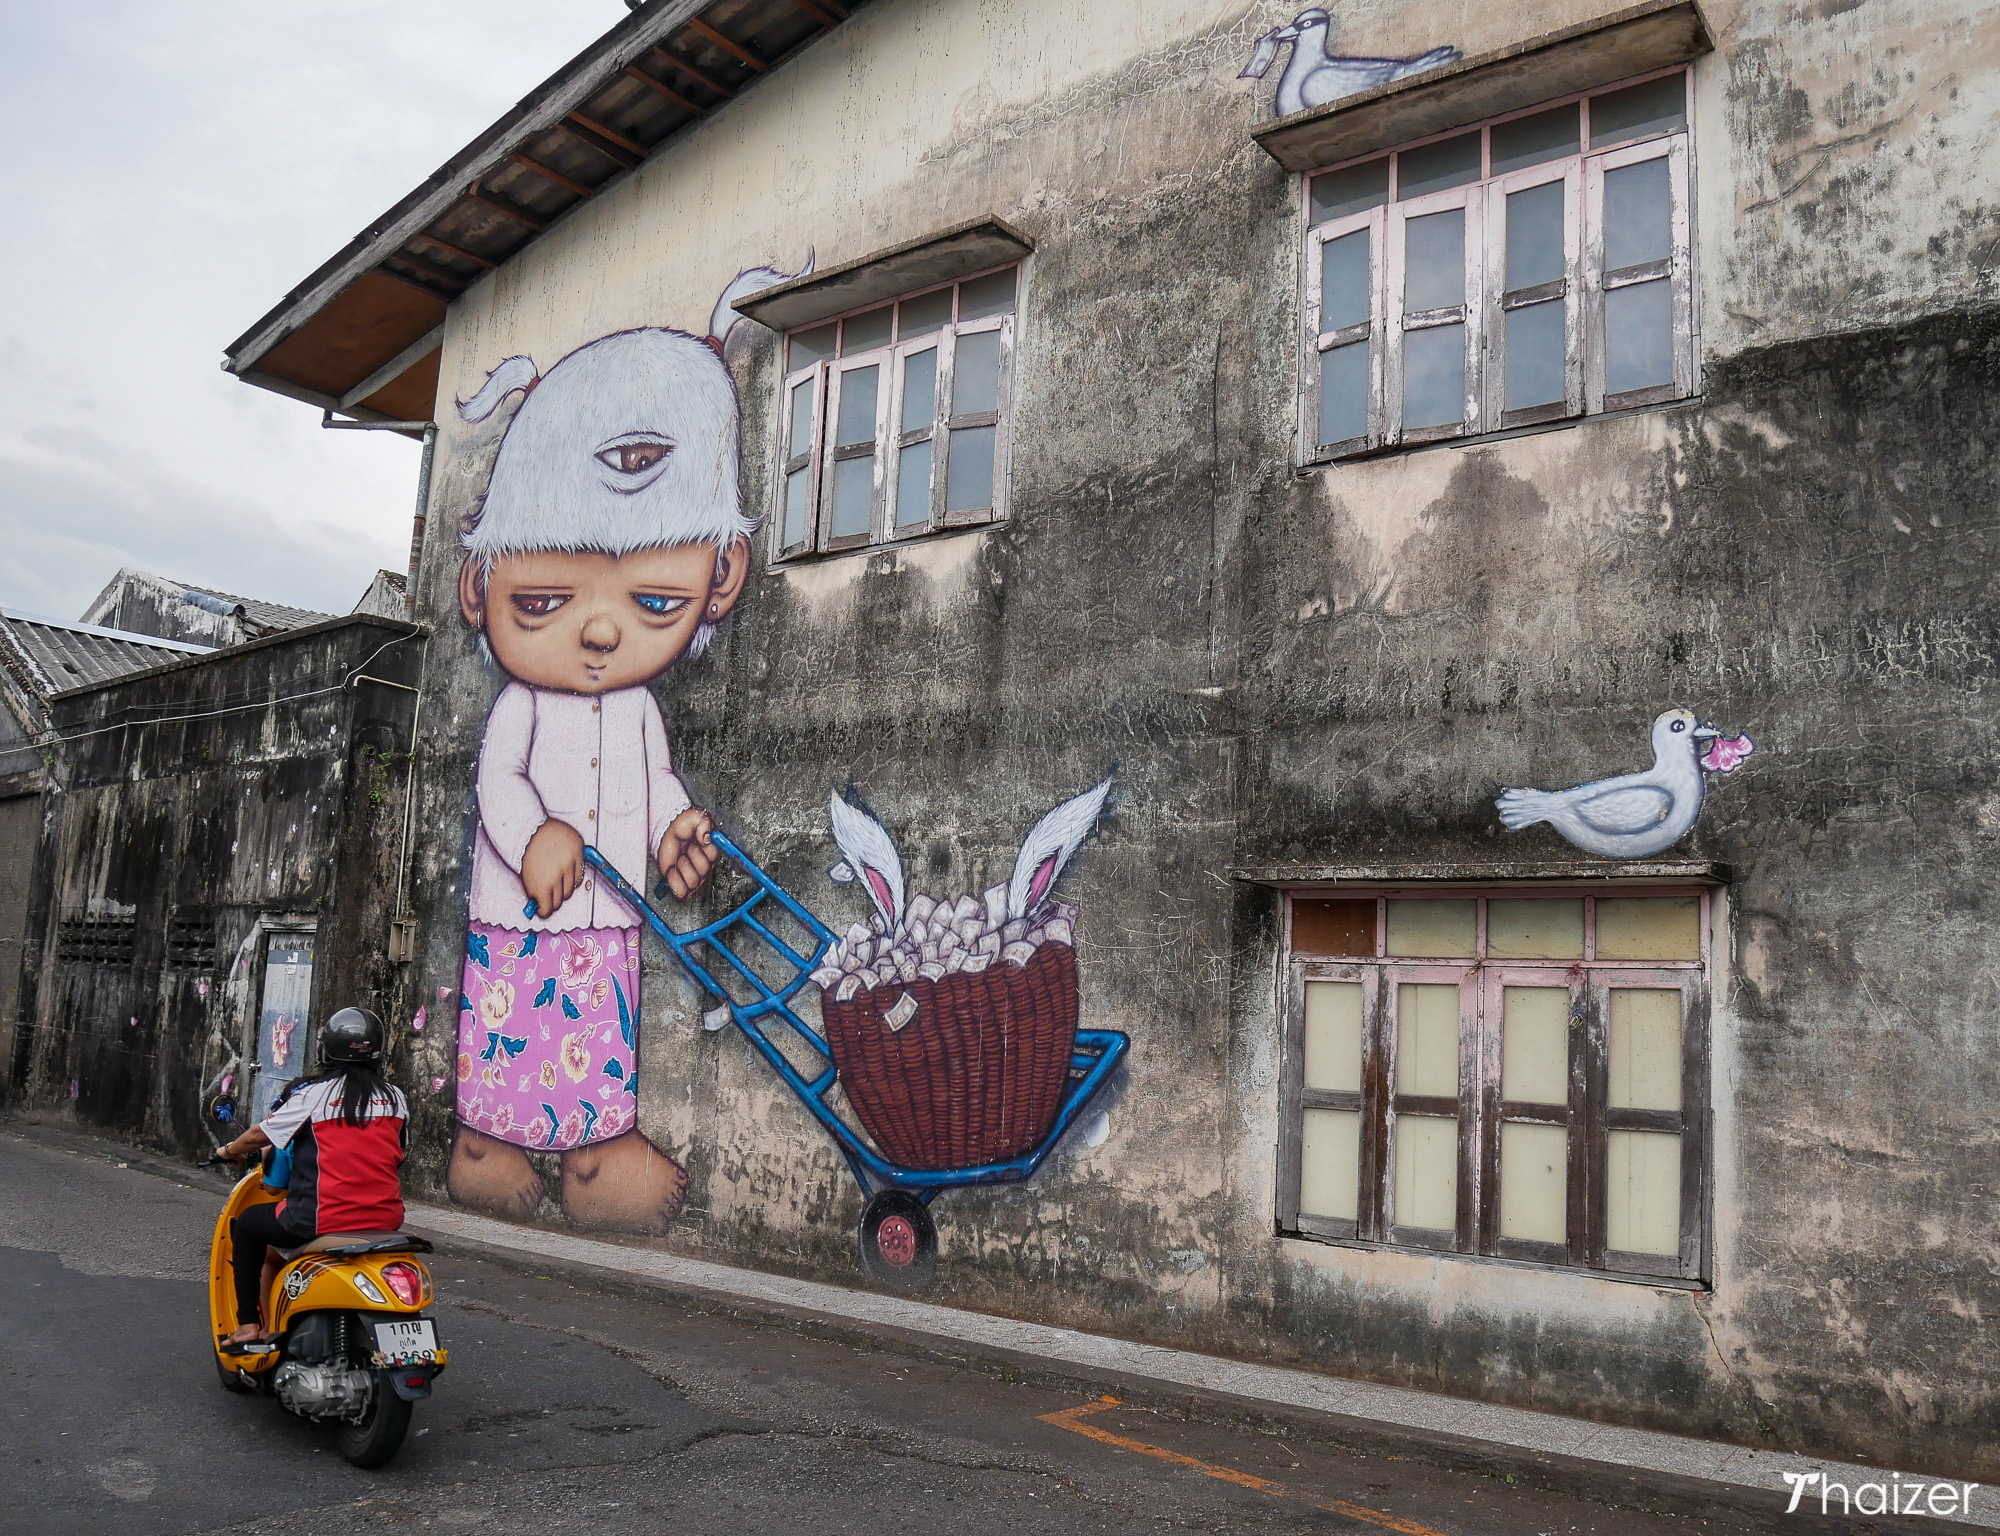 Breakfast by Alex Face, Phuket artwork at Downtown Market